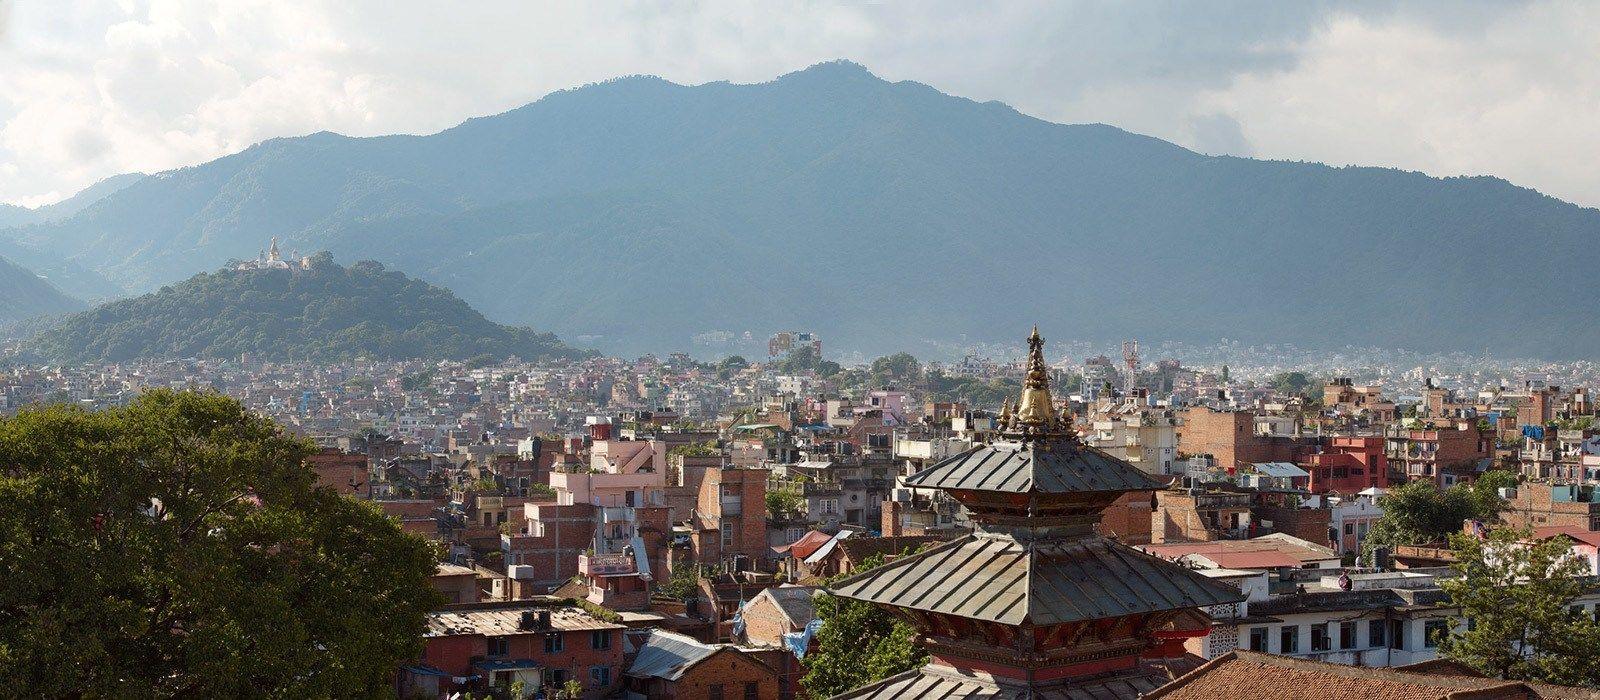 Nepal & Indien: Beeindruckender Himalaja & kulturelle Vielfalt Urlaub 1